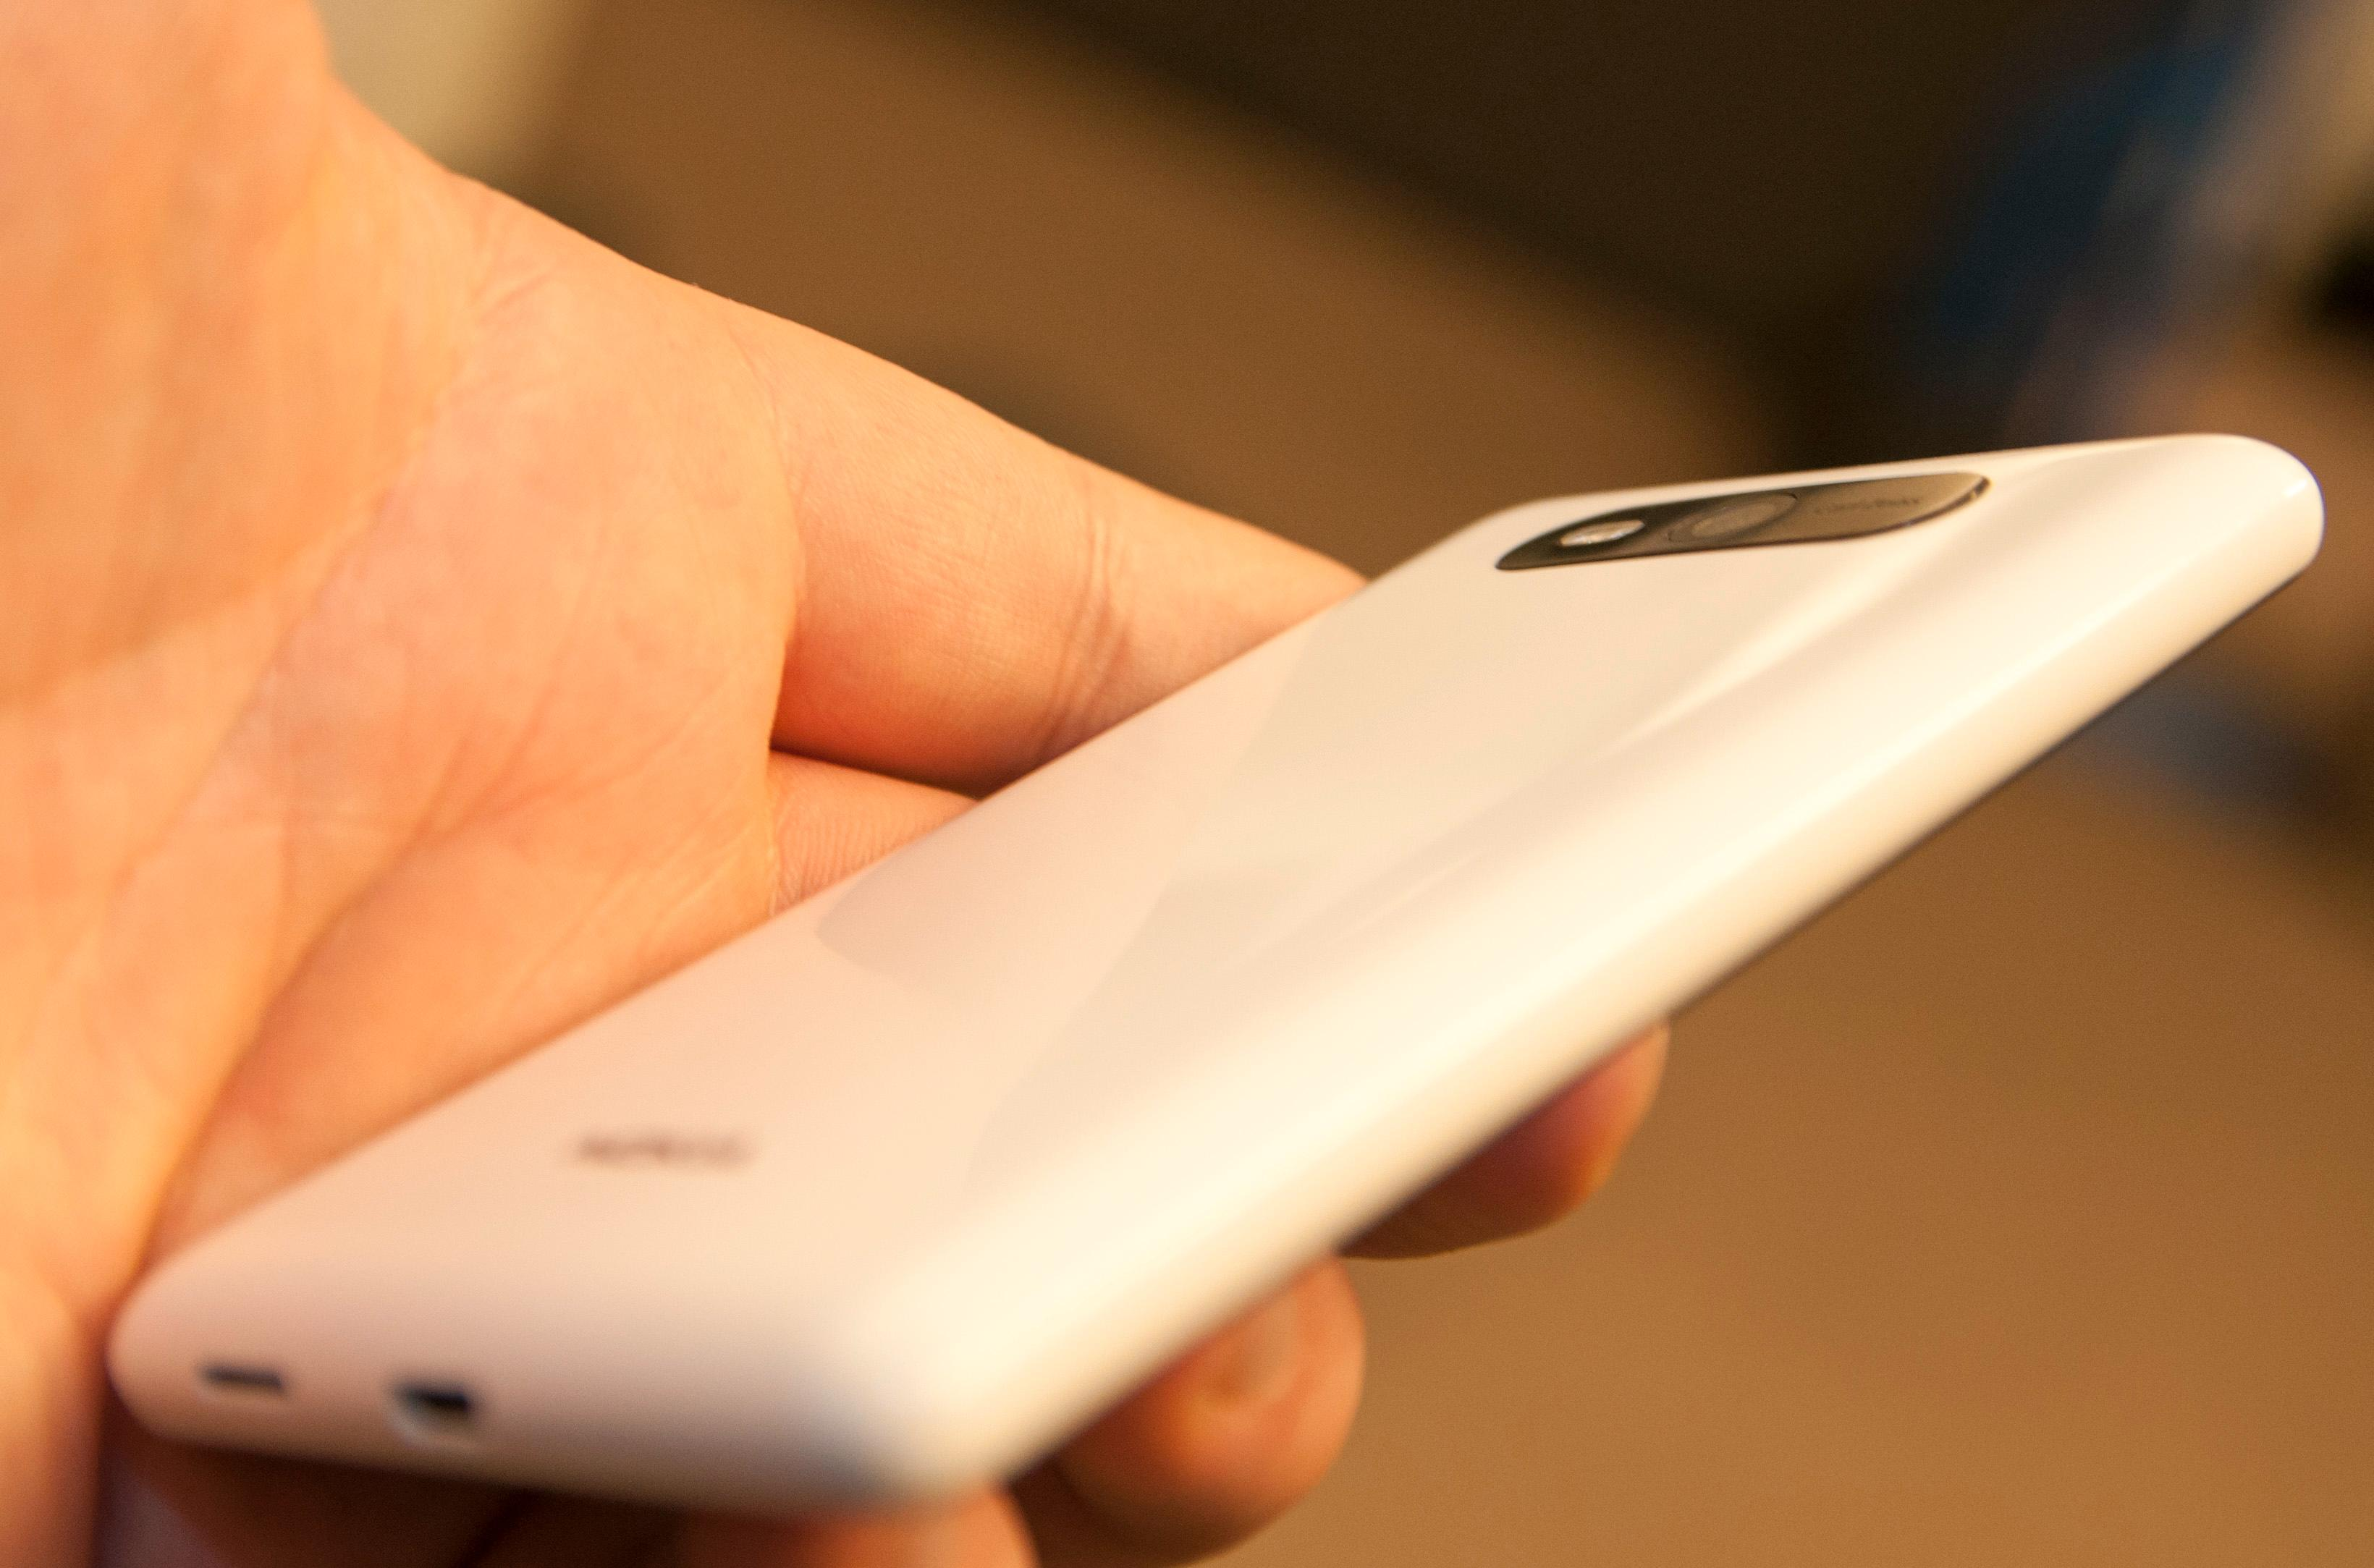 Slik ser Lumia 820 ut fra siden.Foto: Finn Jarle Kvalheim, Amobil.no